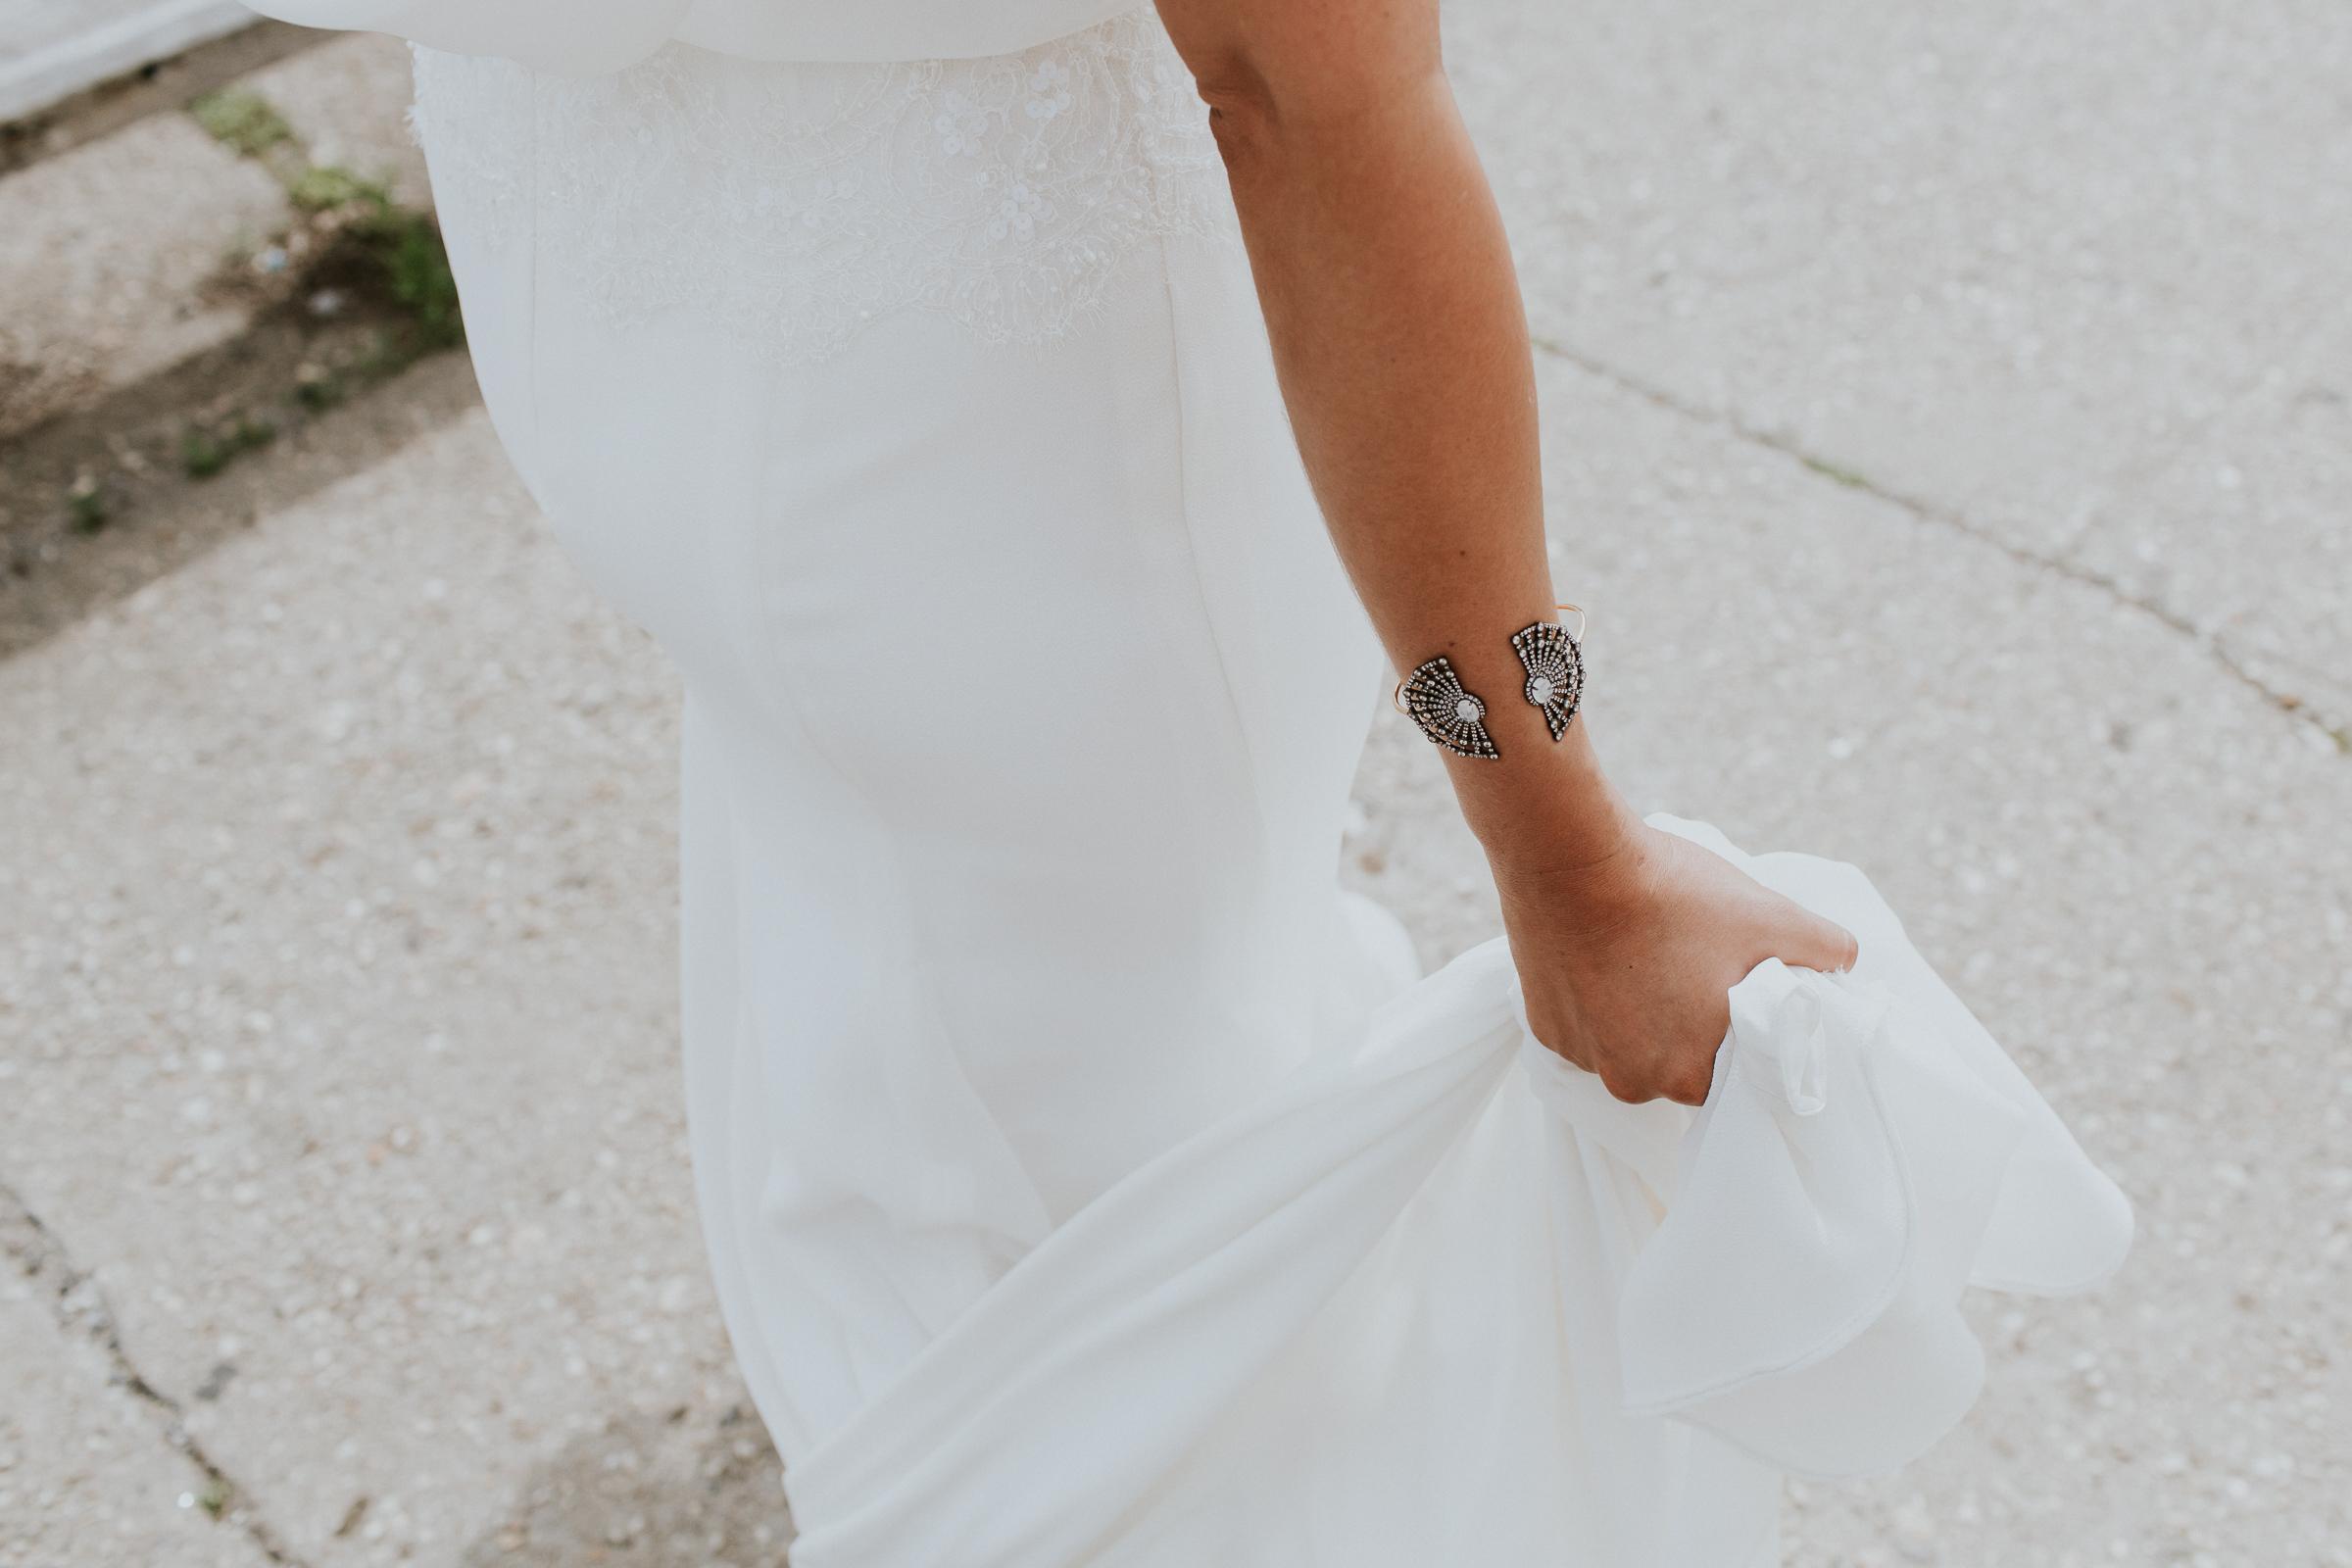 501-Union-Brooklyn-Fine-Art-Documentary-Wedding-Photographer-40.jpg